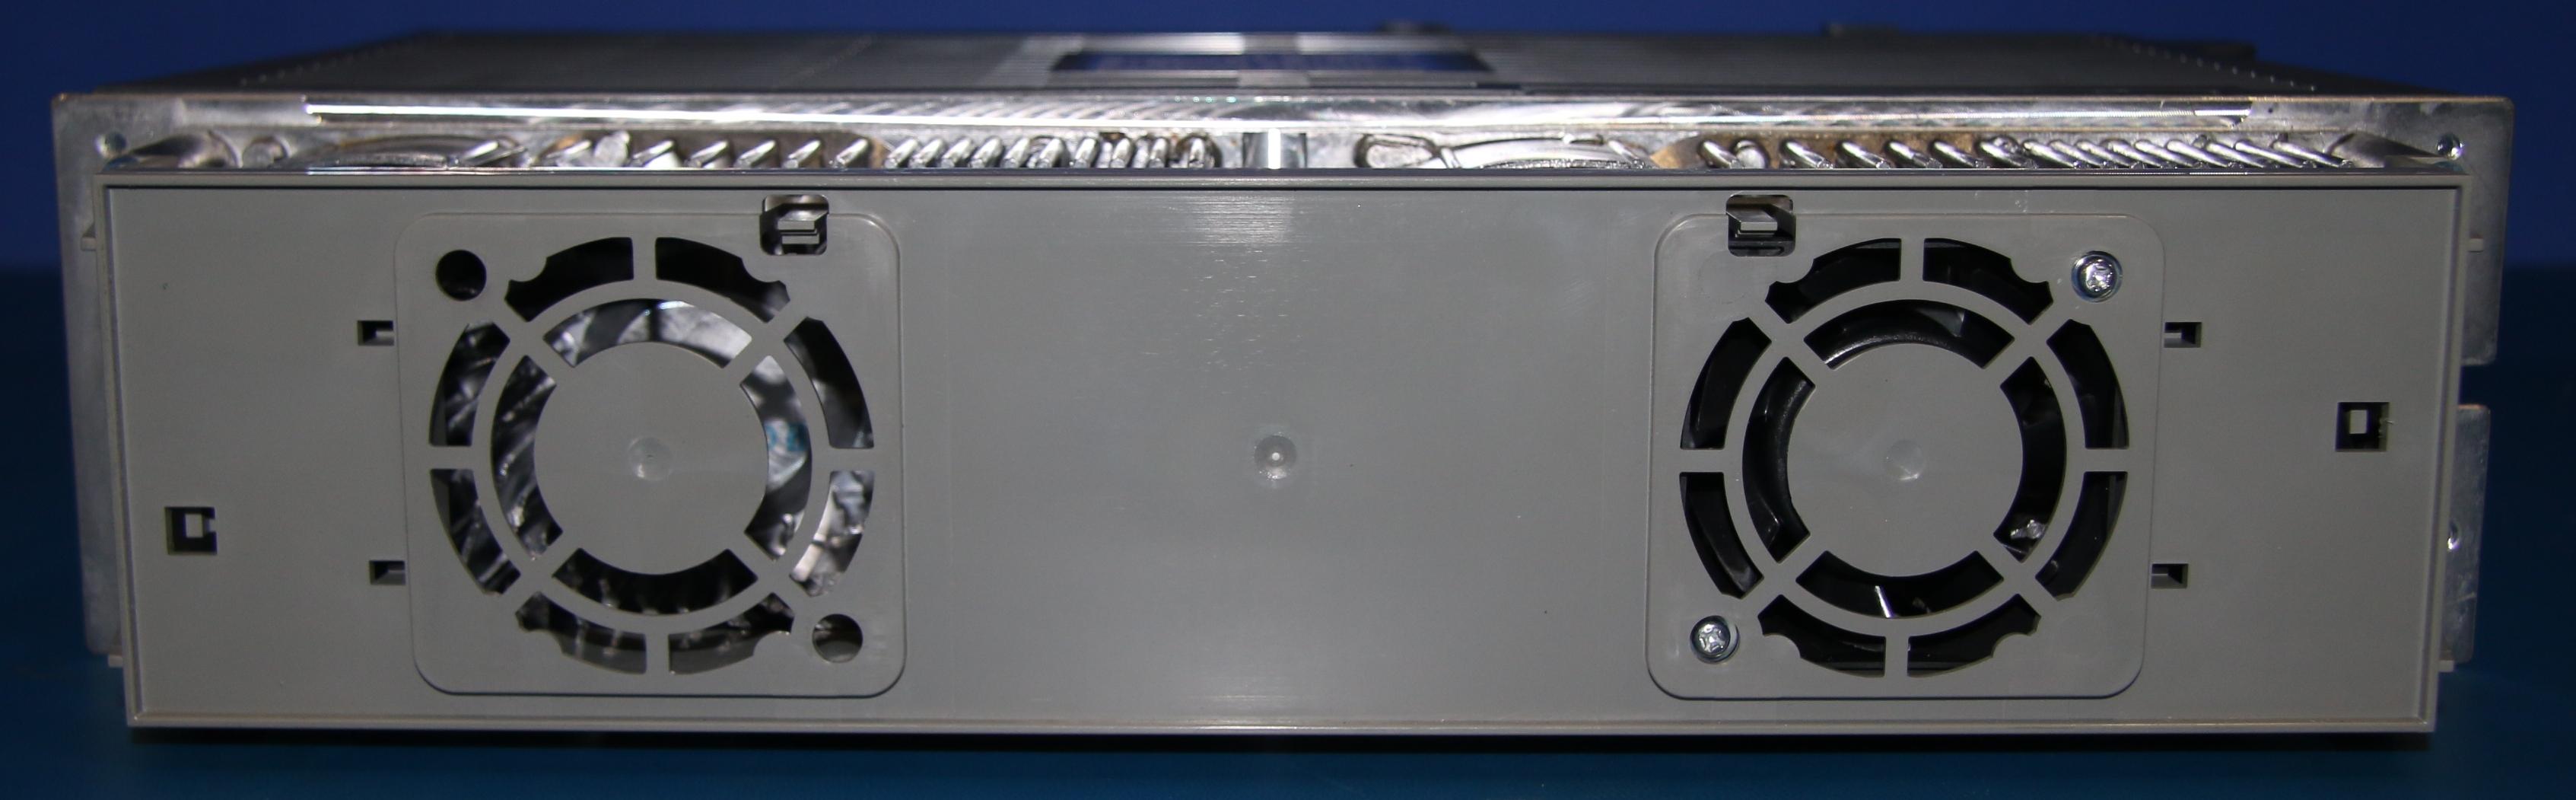 (1) New Mitsubishi MDS-D-CV-110 Power Supply Unit 15099